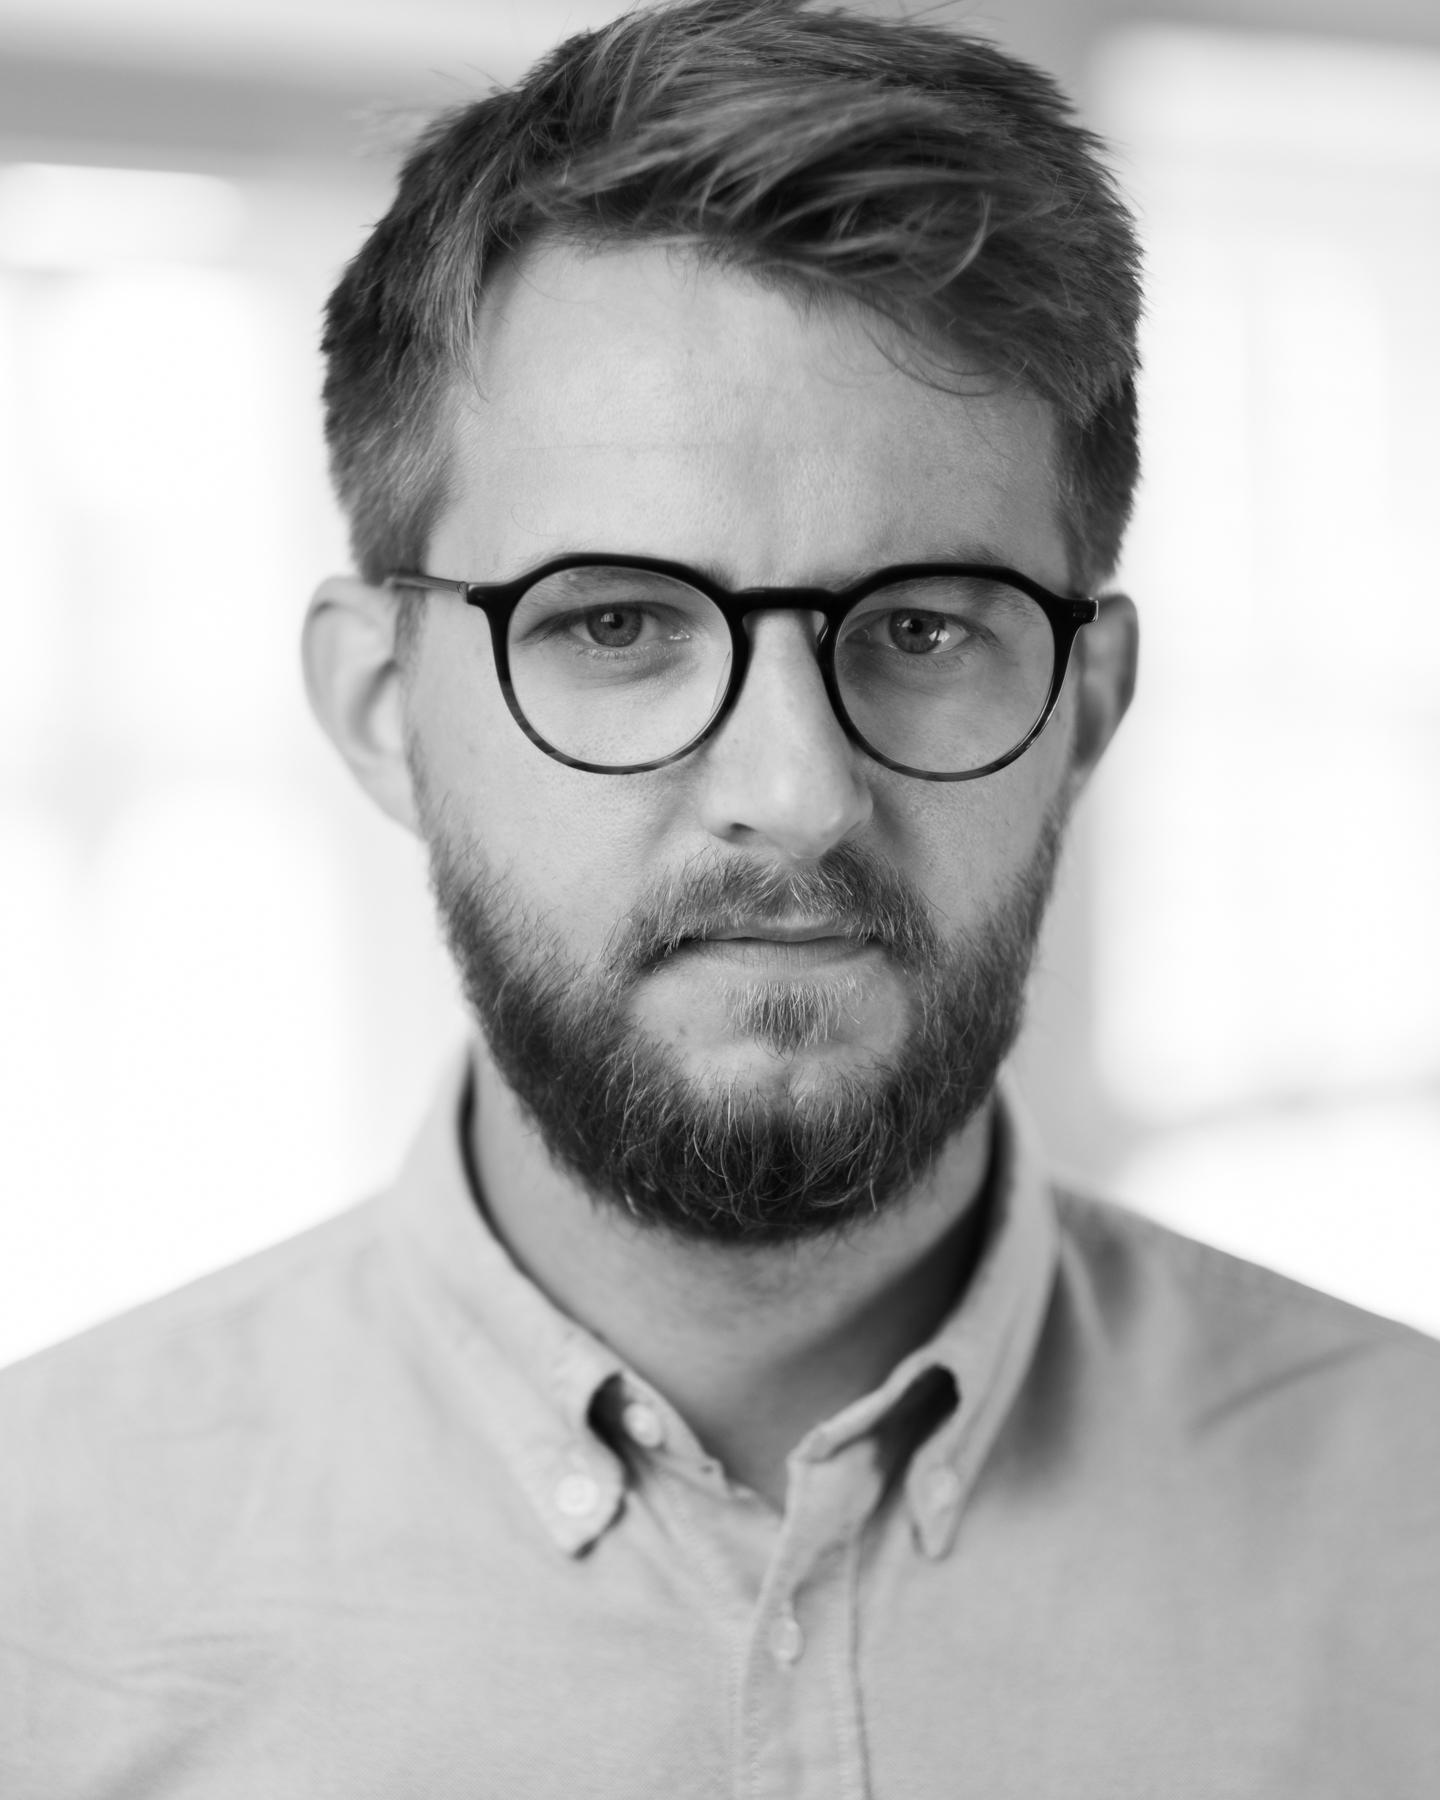 Alex Hughes, Entrepreneurial Business Consultant at Shift Momentum